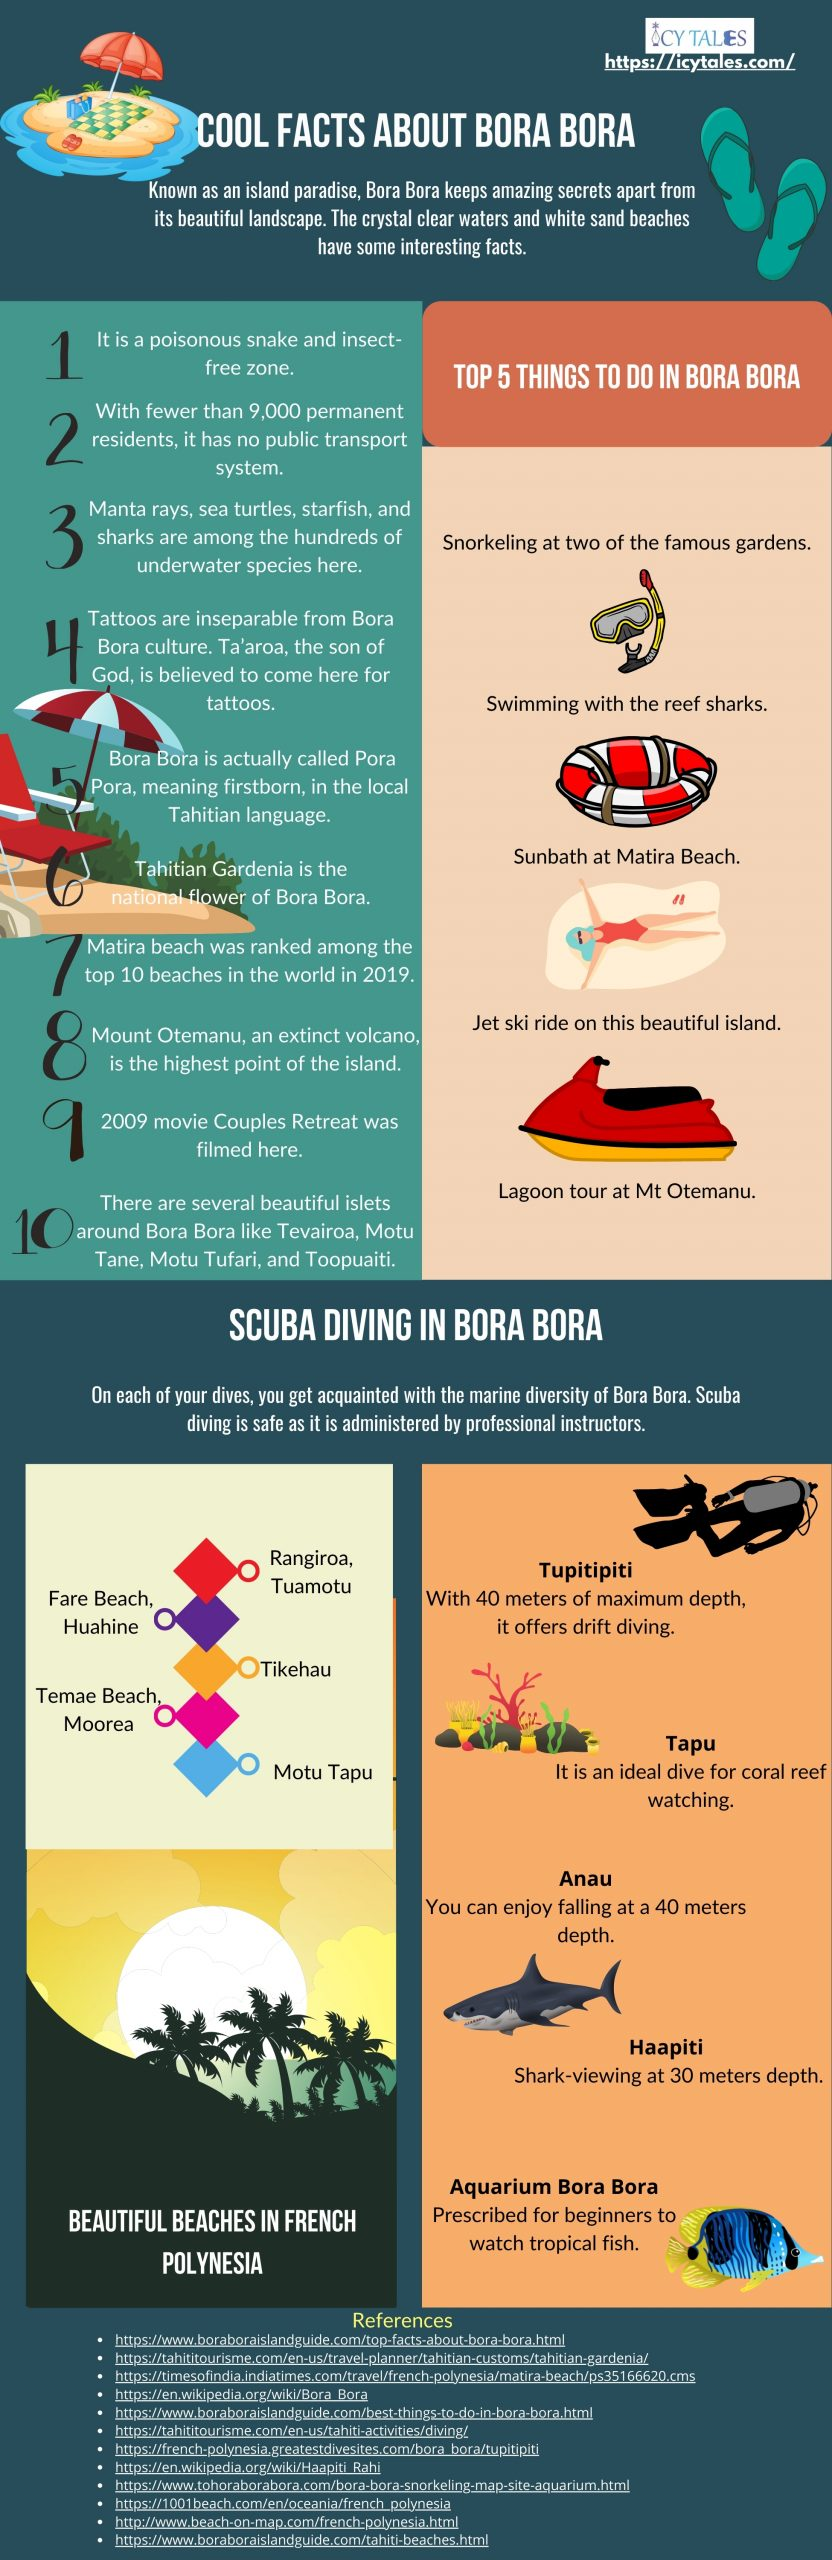 Cool Facts About Bora Bora